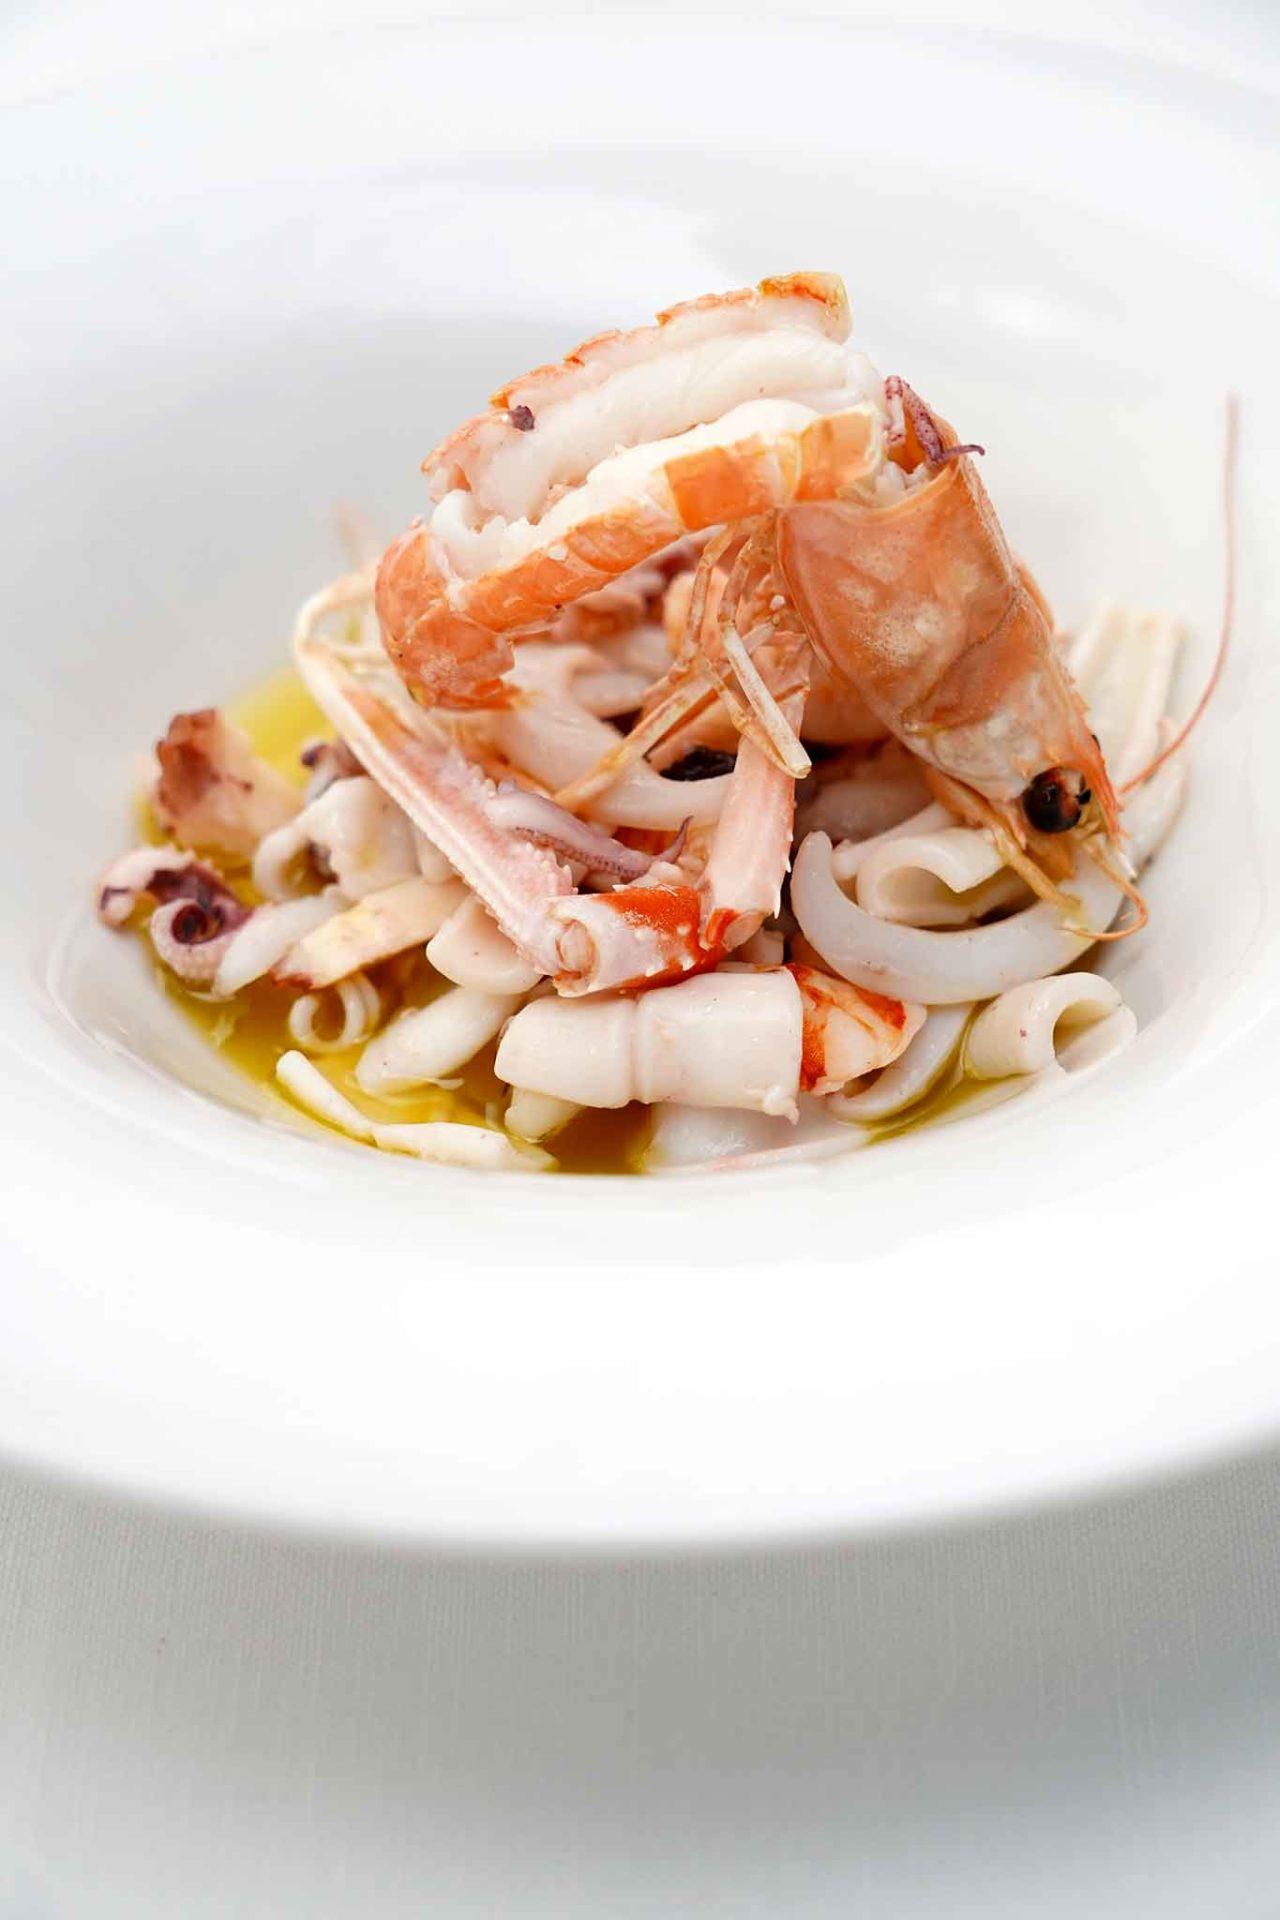 insalata tiepida di mare Pescheria Salerno